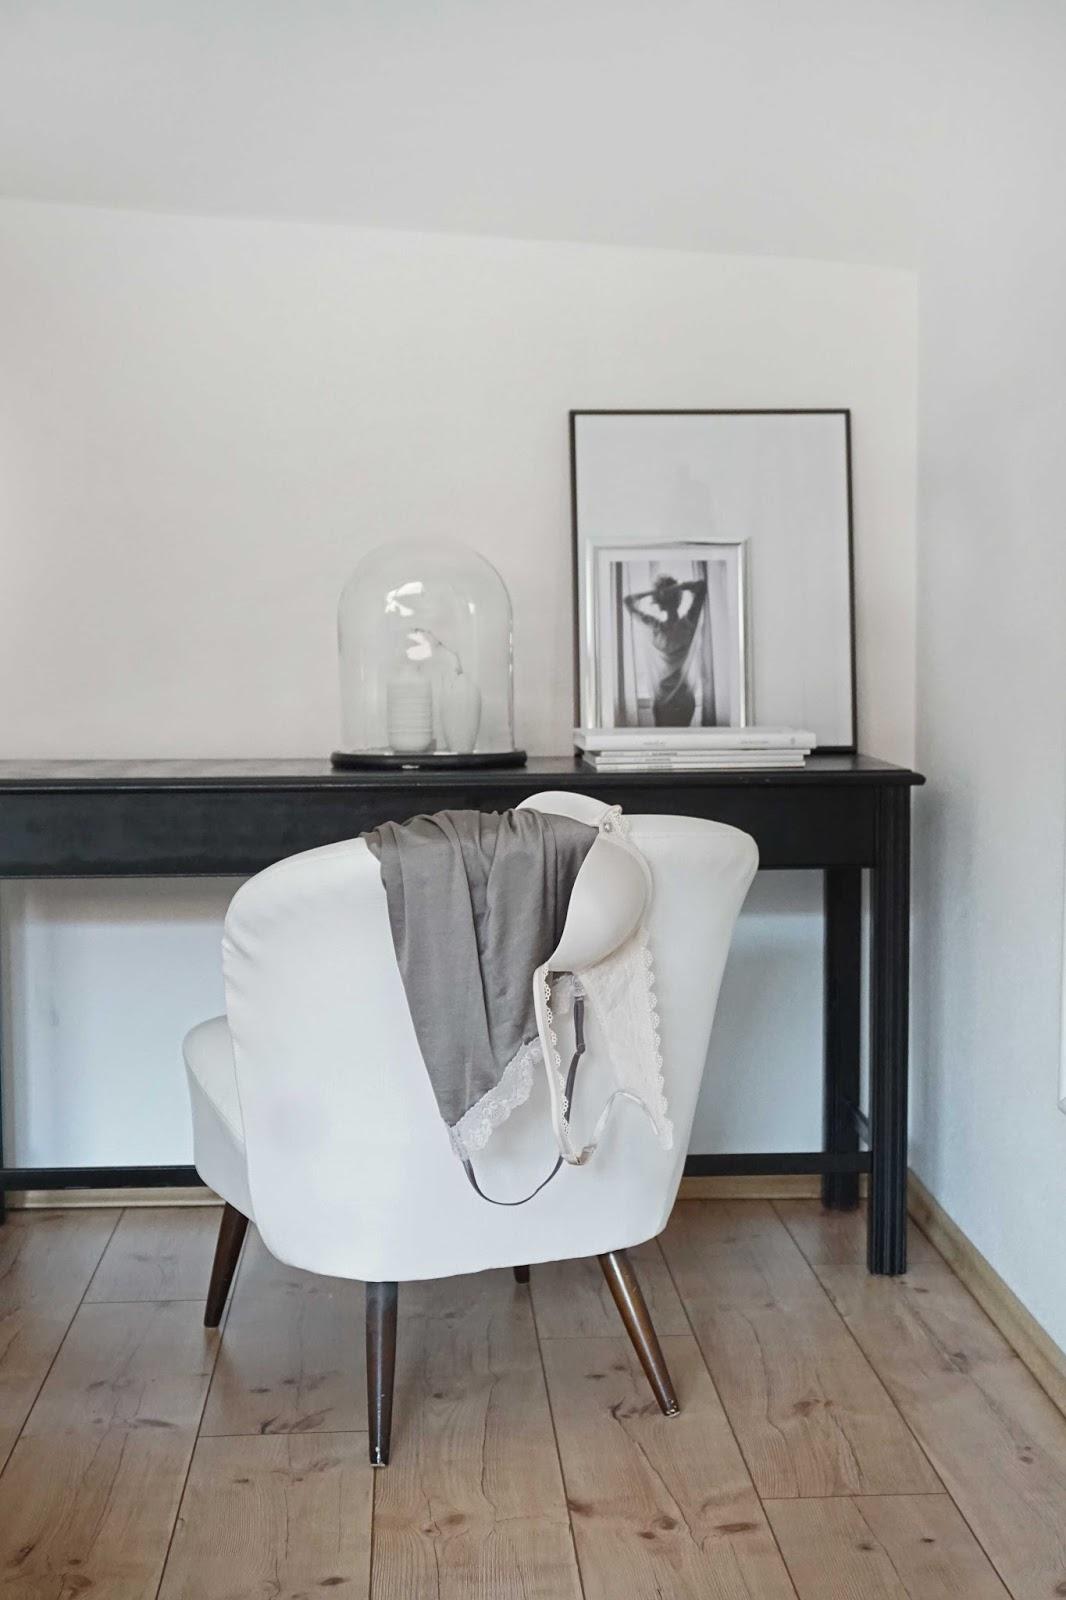 wie man sonntags erfolgreich im bett verbringt s t i l r e i c h blog. Black Bedroom Furniture Sets. Home Design Ideas